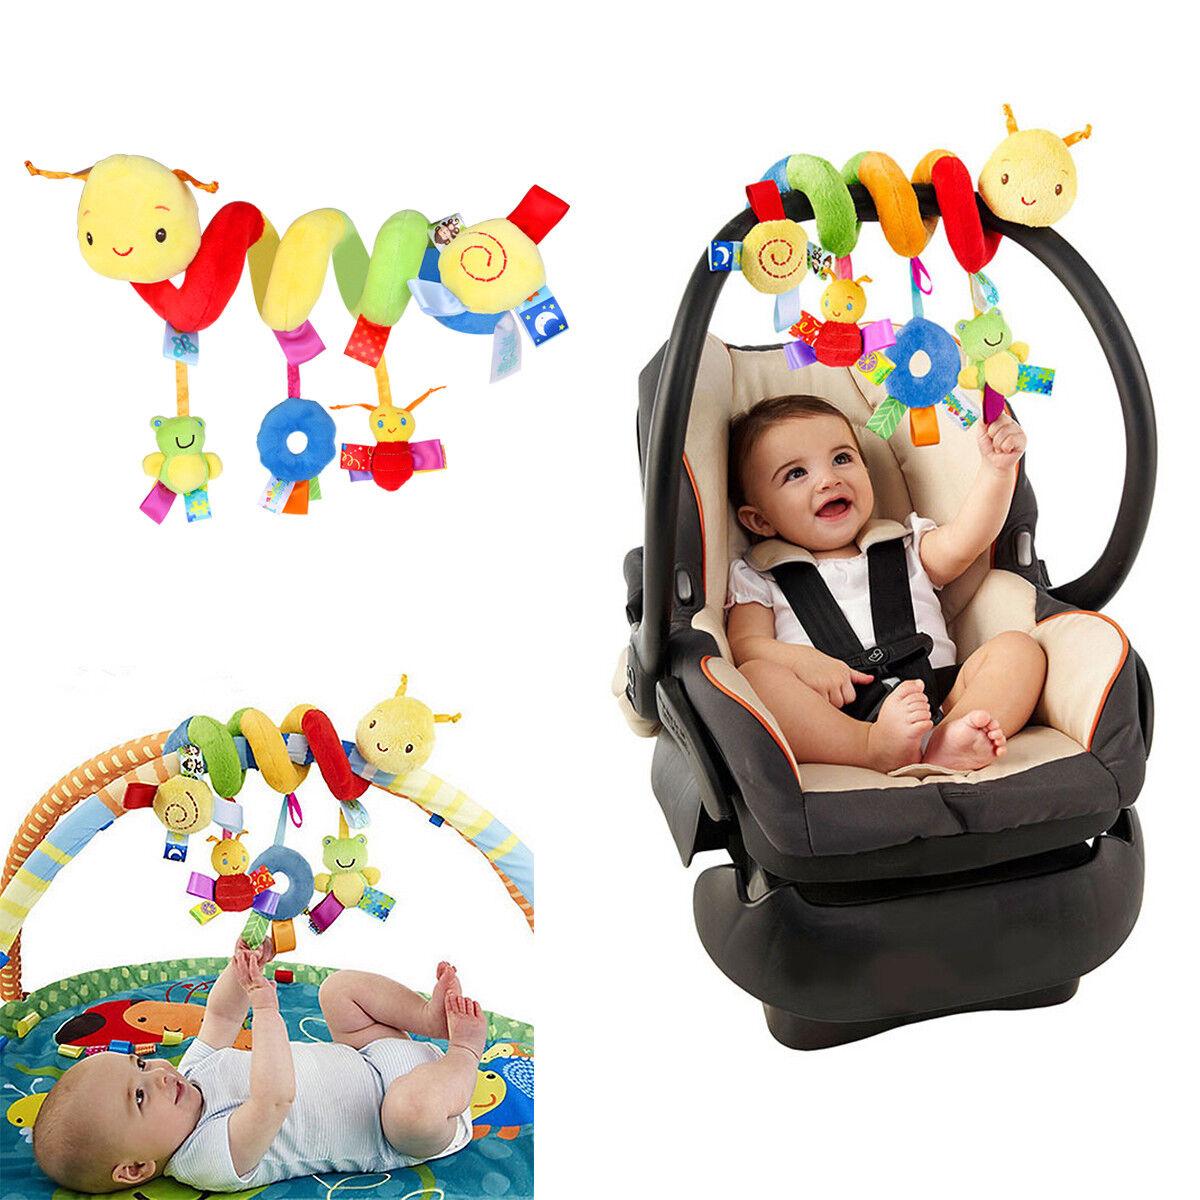 Baby Kinderwagenkette Rassel Spirale Greiflinge Kinderbett Babybett Spielzeug